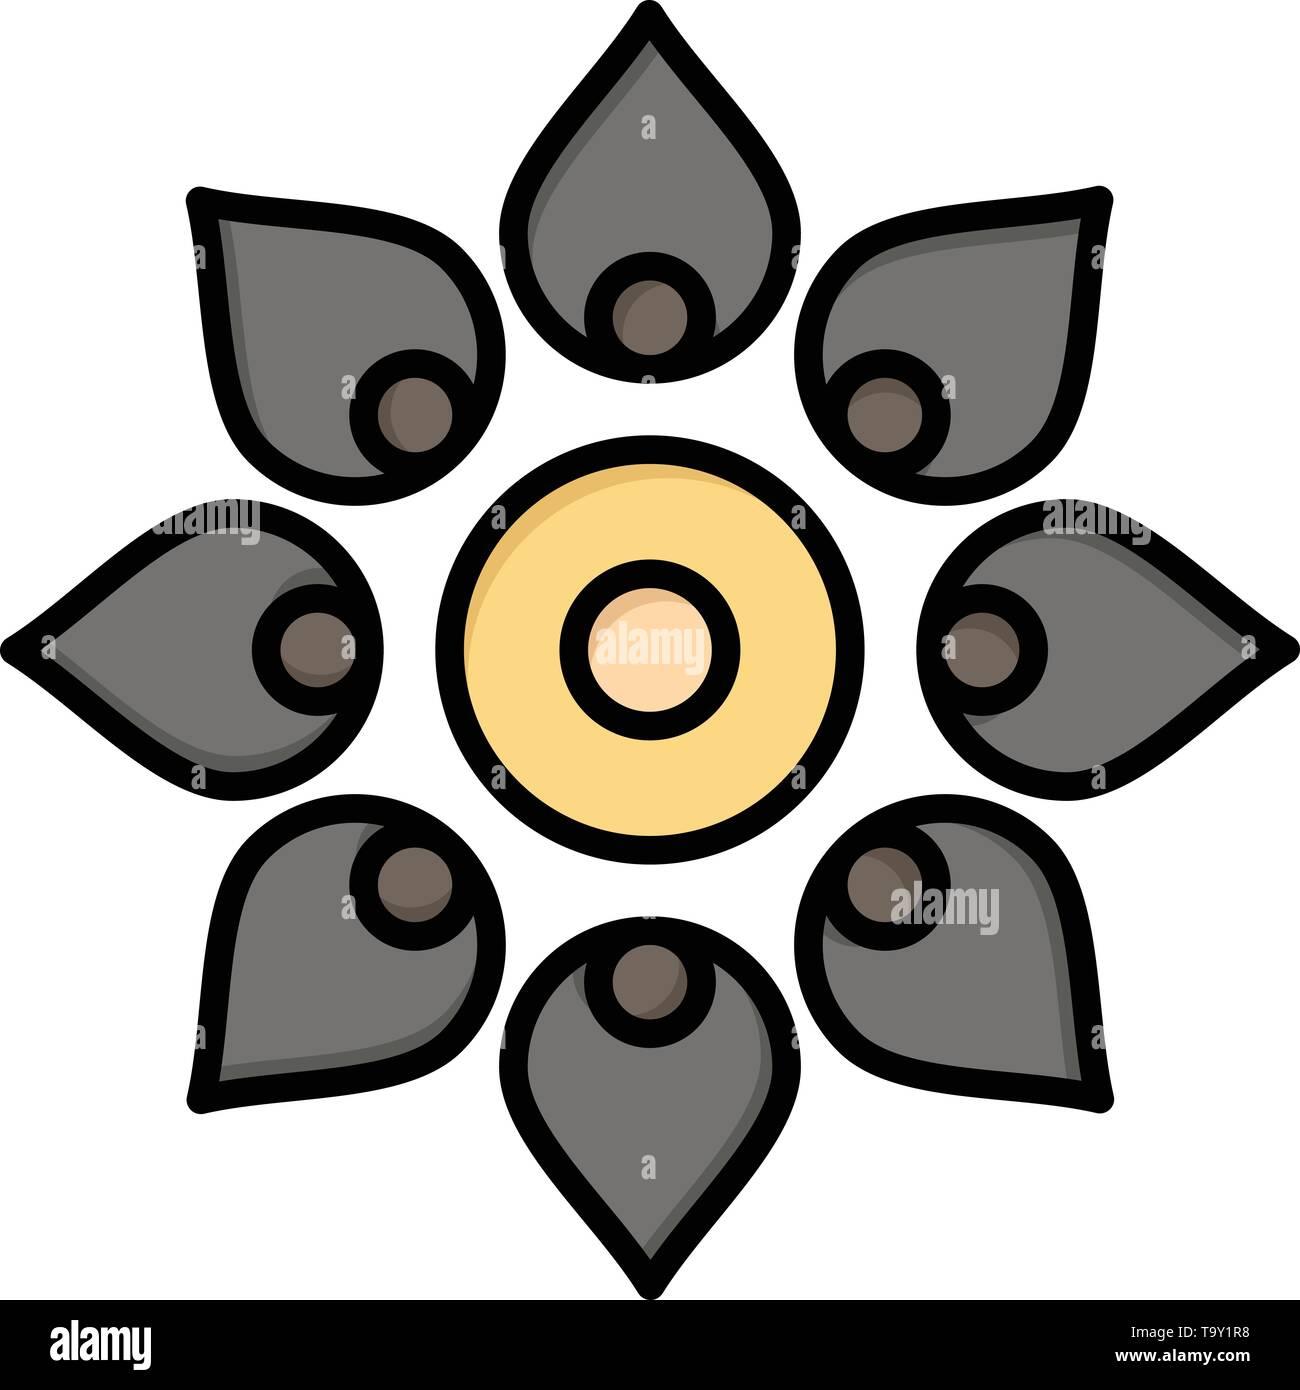 Celebrate, Decorate, Decoration, Diwali, Hindu, Holi  Flat Color Icon. Vector icon banner Template - Stock Image